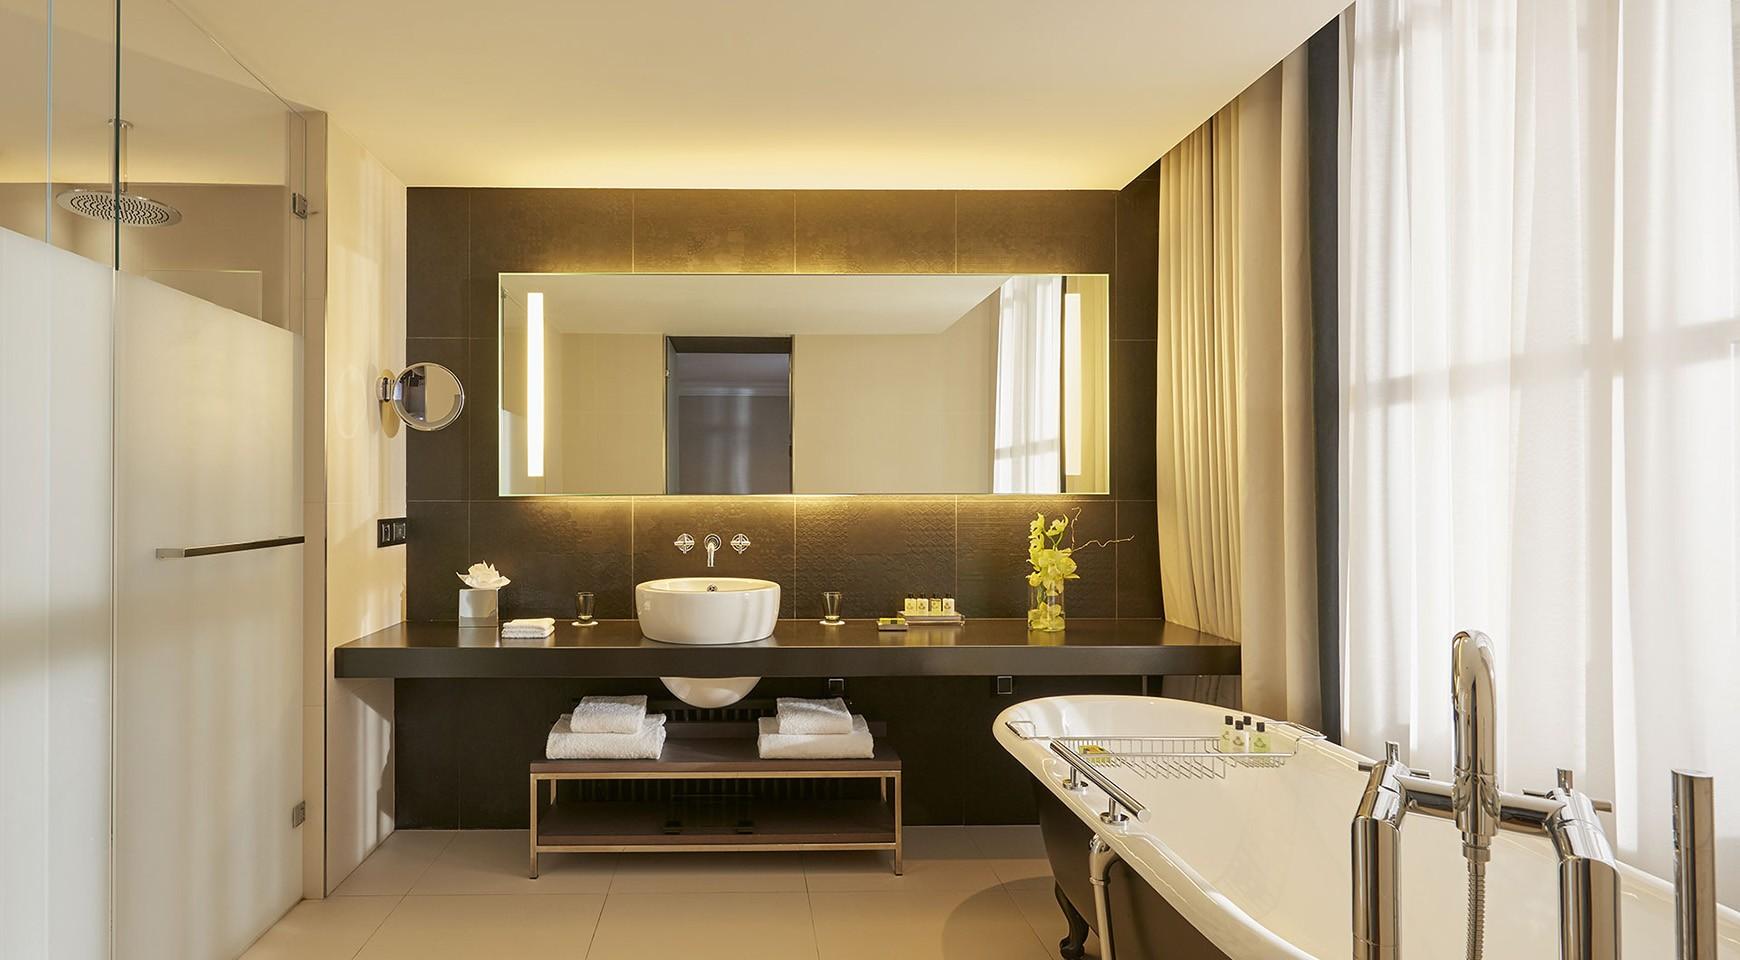 InterContinental-Marseille-Hotel-Dieu-Suite-Junior-avec-terrasse-salle-de-bain